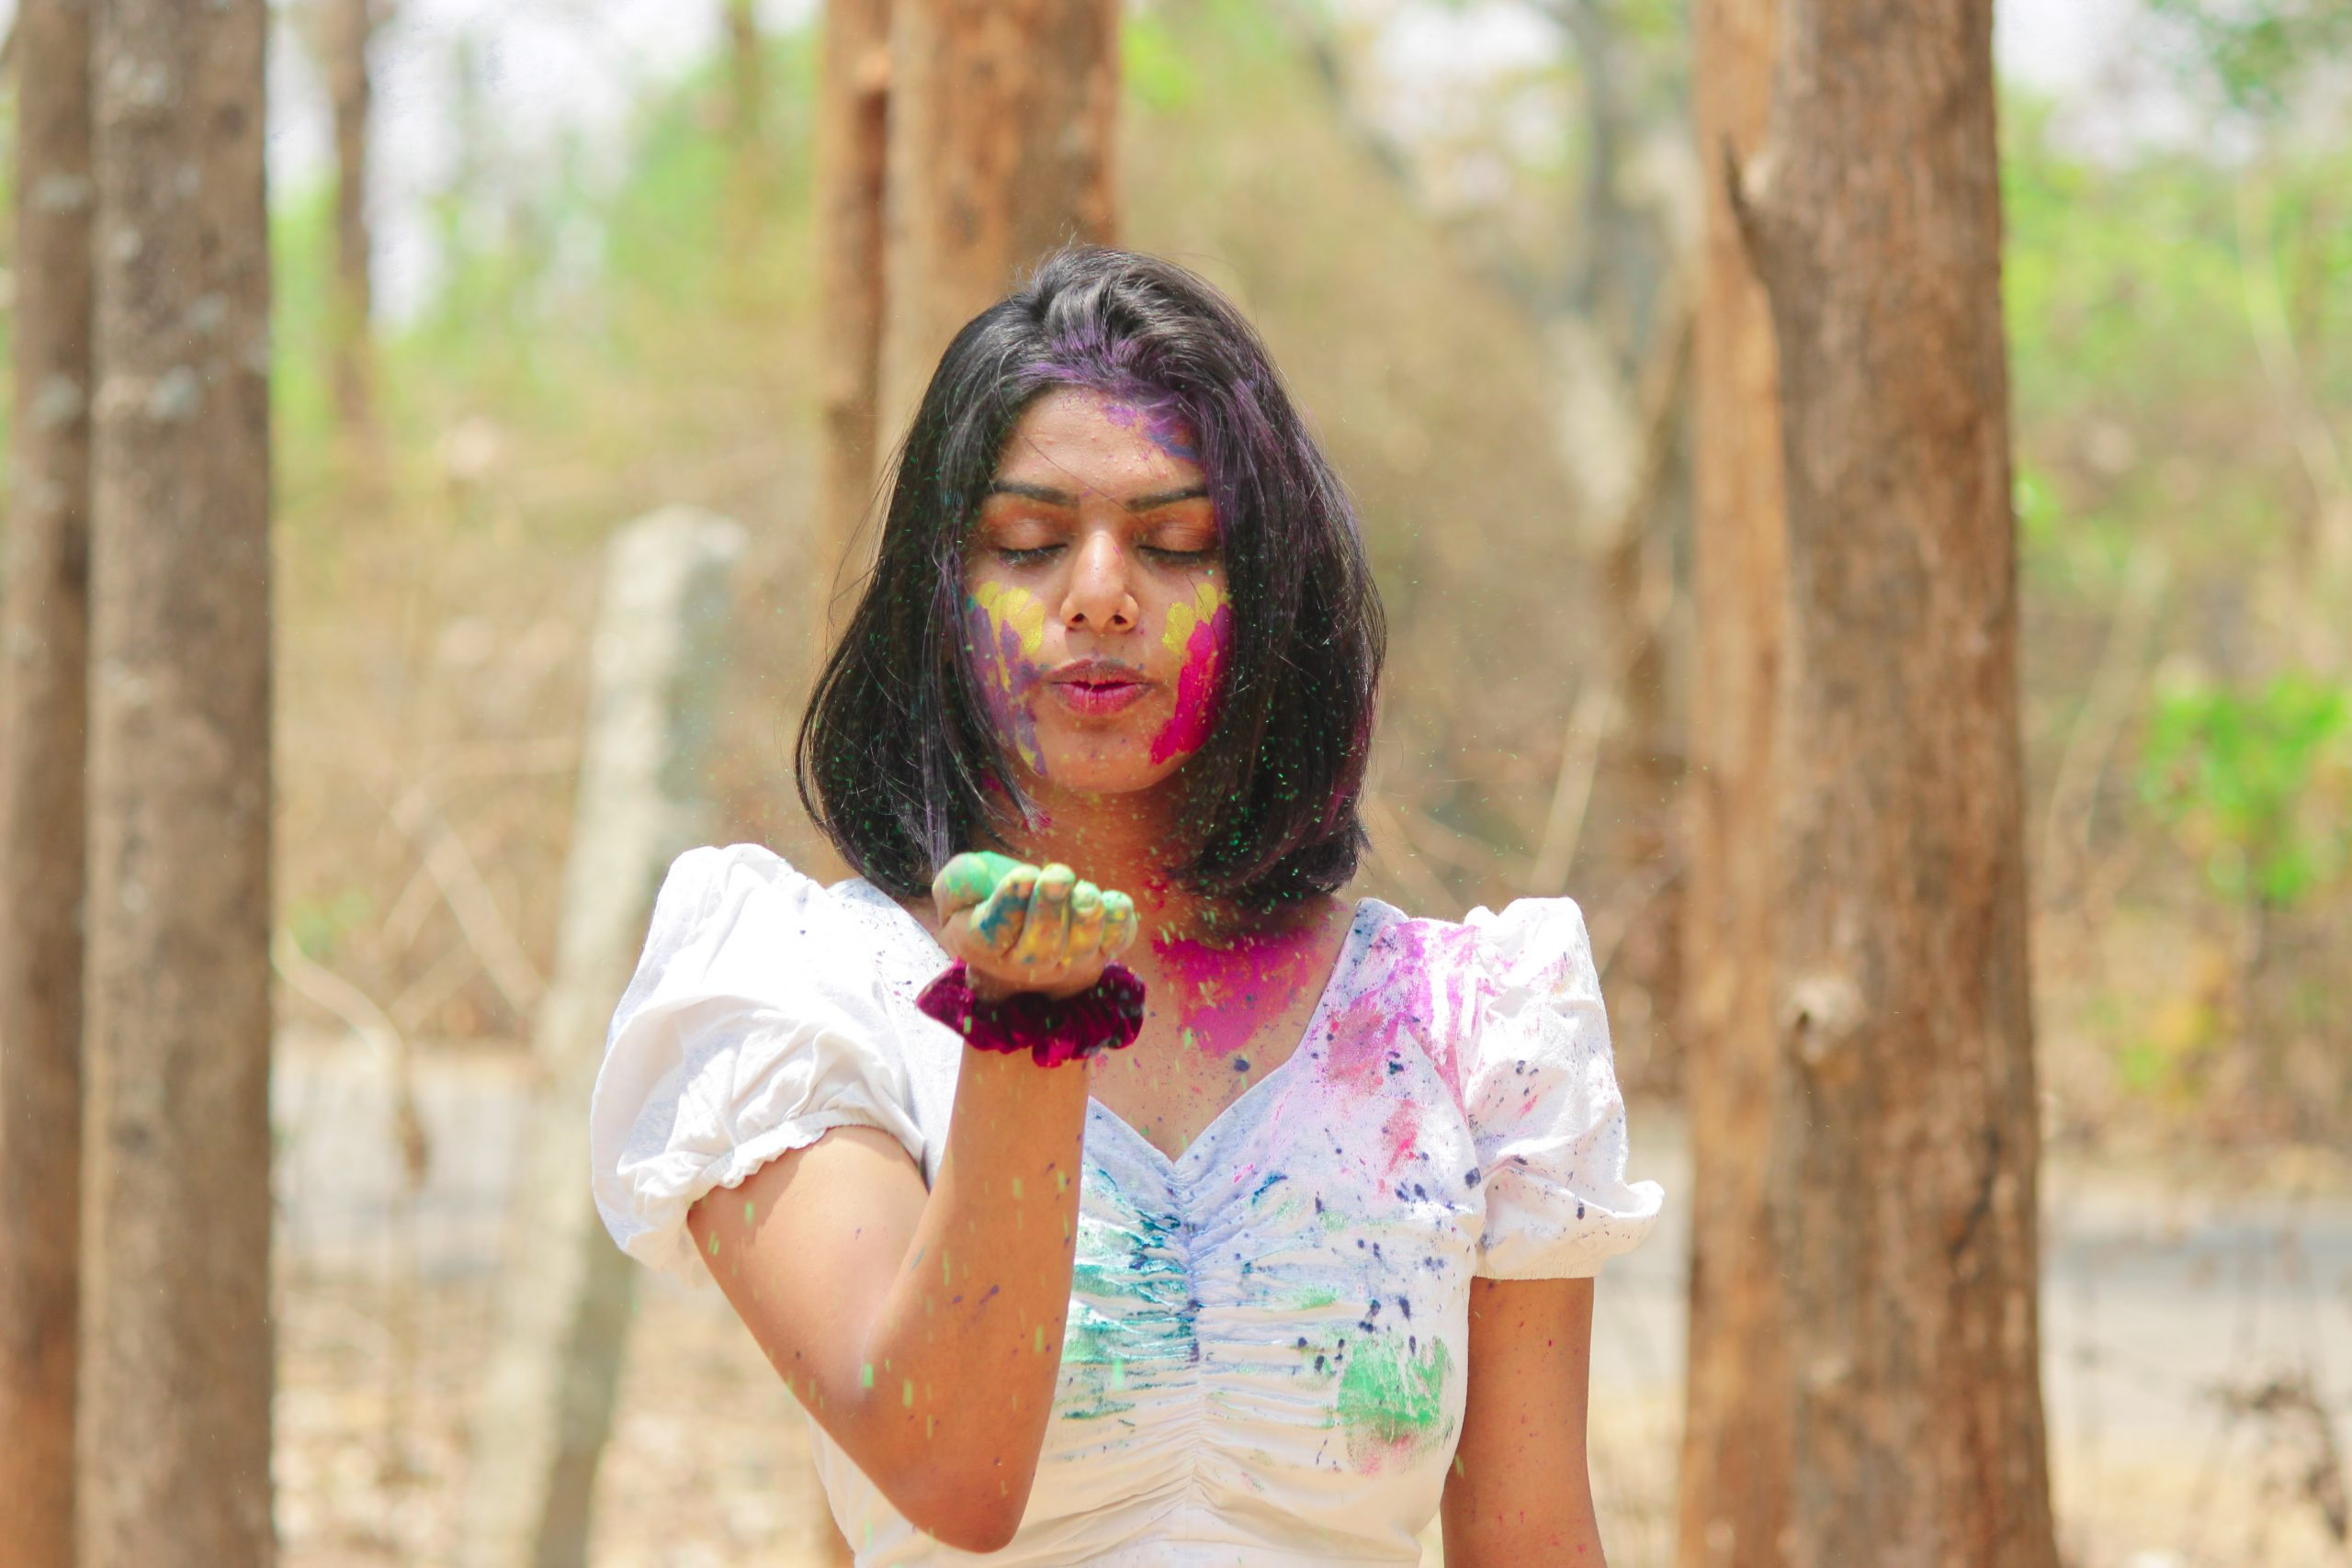 A girl celebrating Holi festival in a jungle